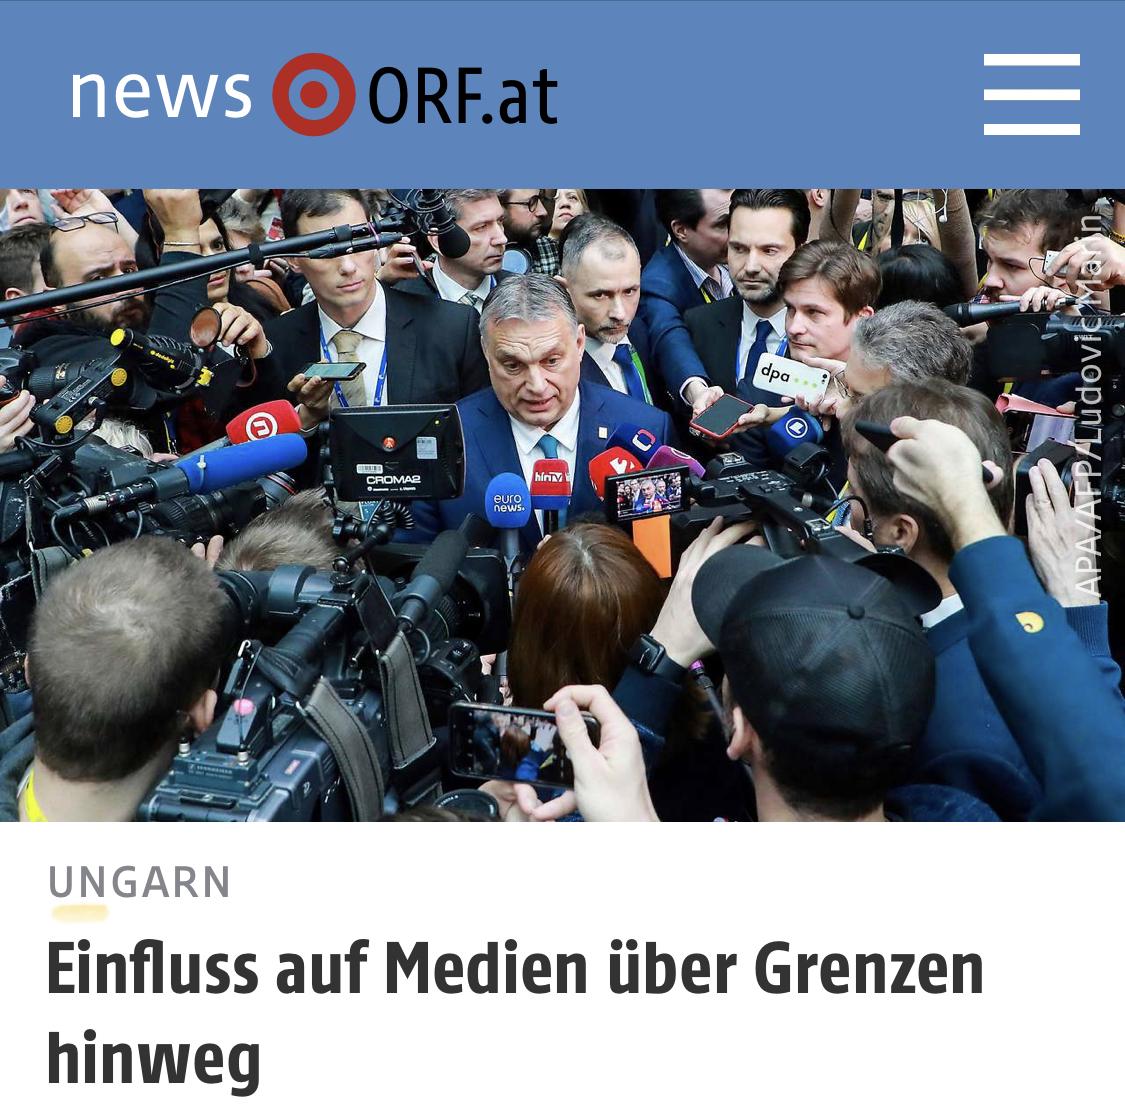 ORF: Πώς η Ουγγαρία επηρεάζει τα μέσα ενημέρωσης στη Σλοβενία και τη Βόρεια Μακεδονία